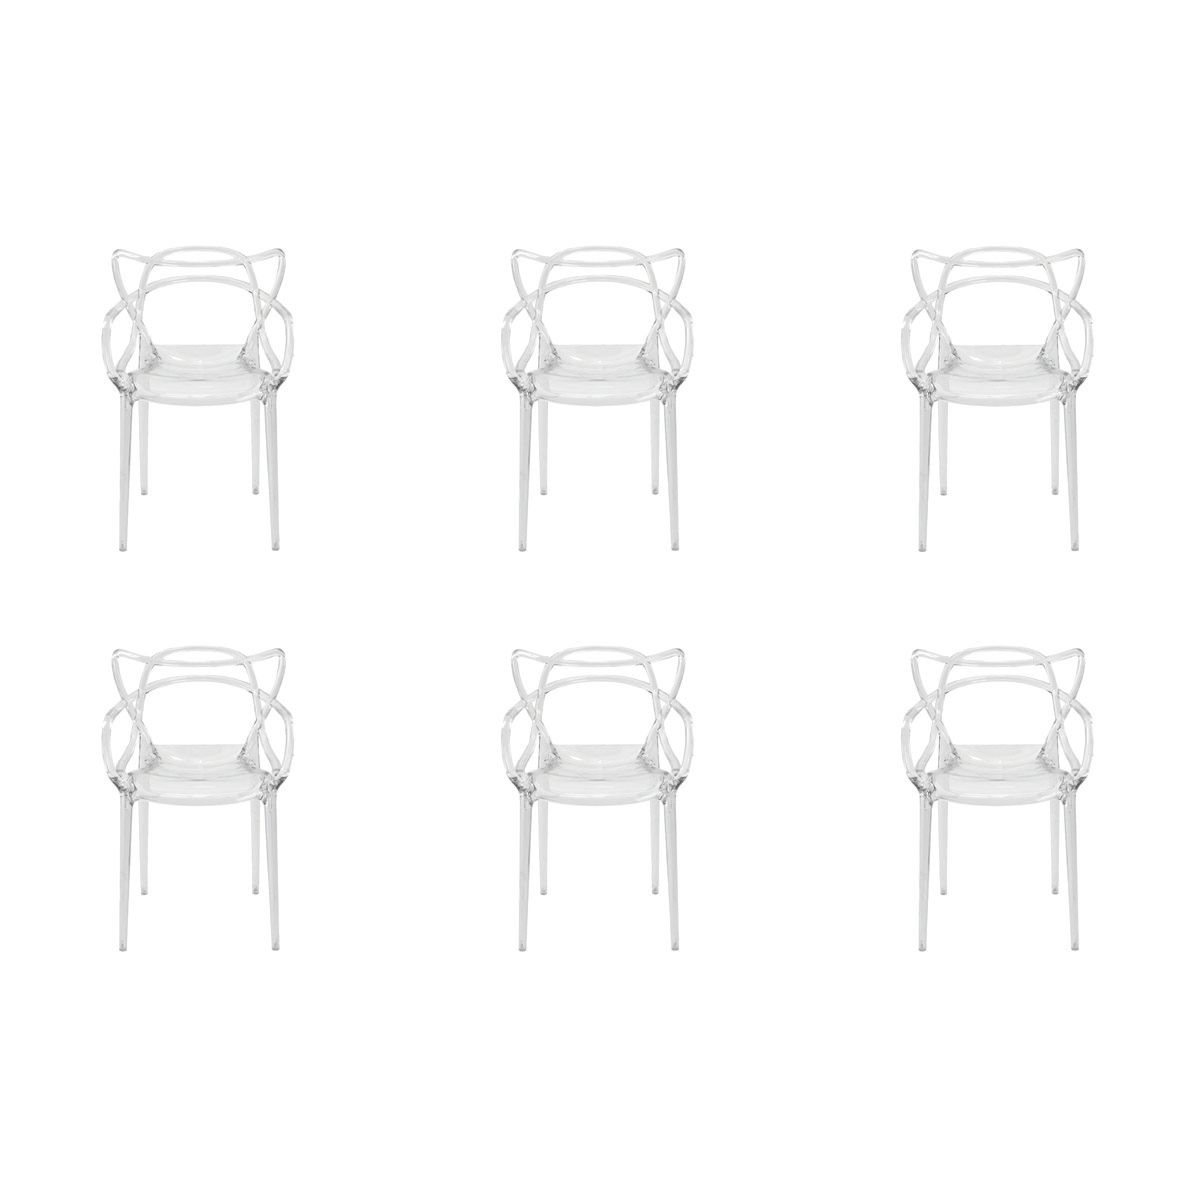 conjunto-6-pecas-cadeira-allegra-masters-de-policarbonato-rivatti